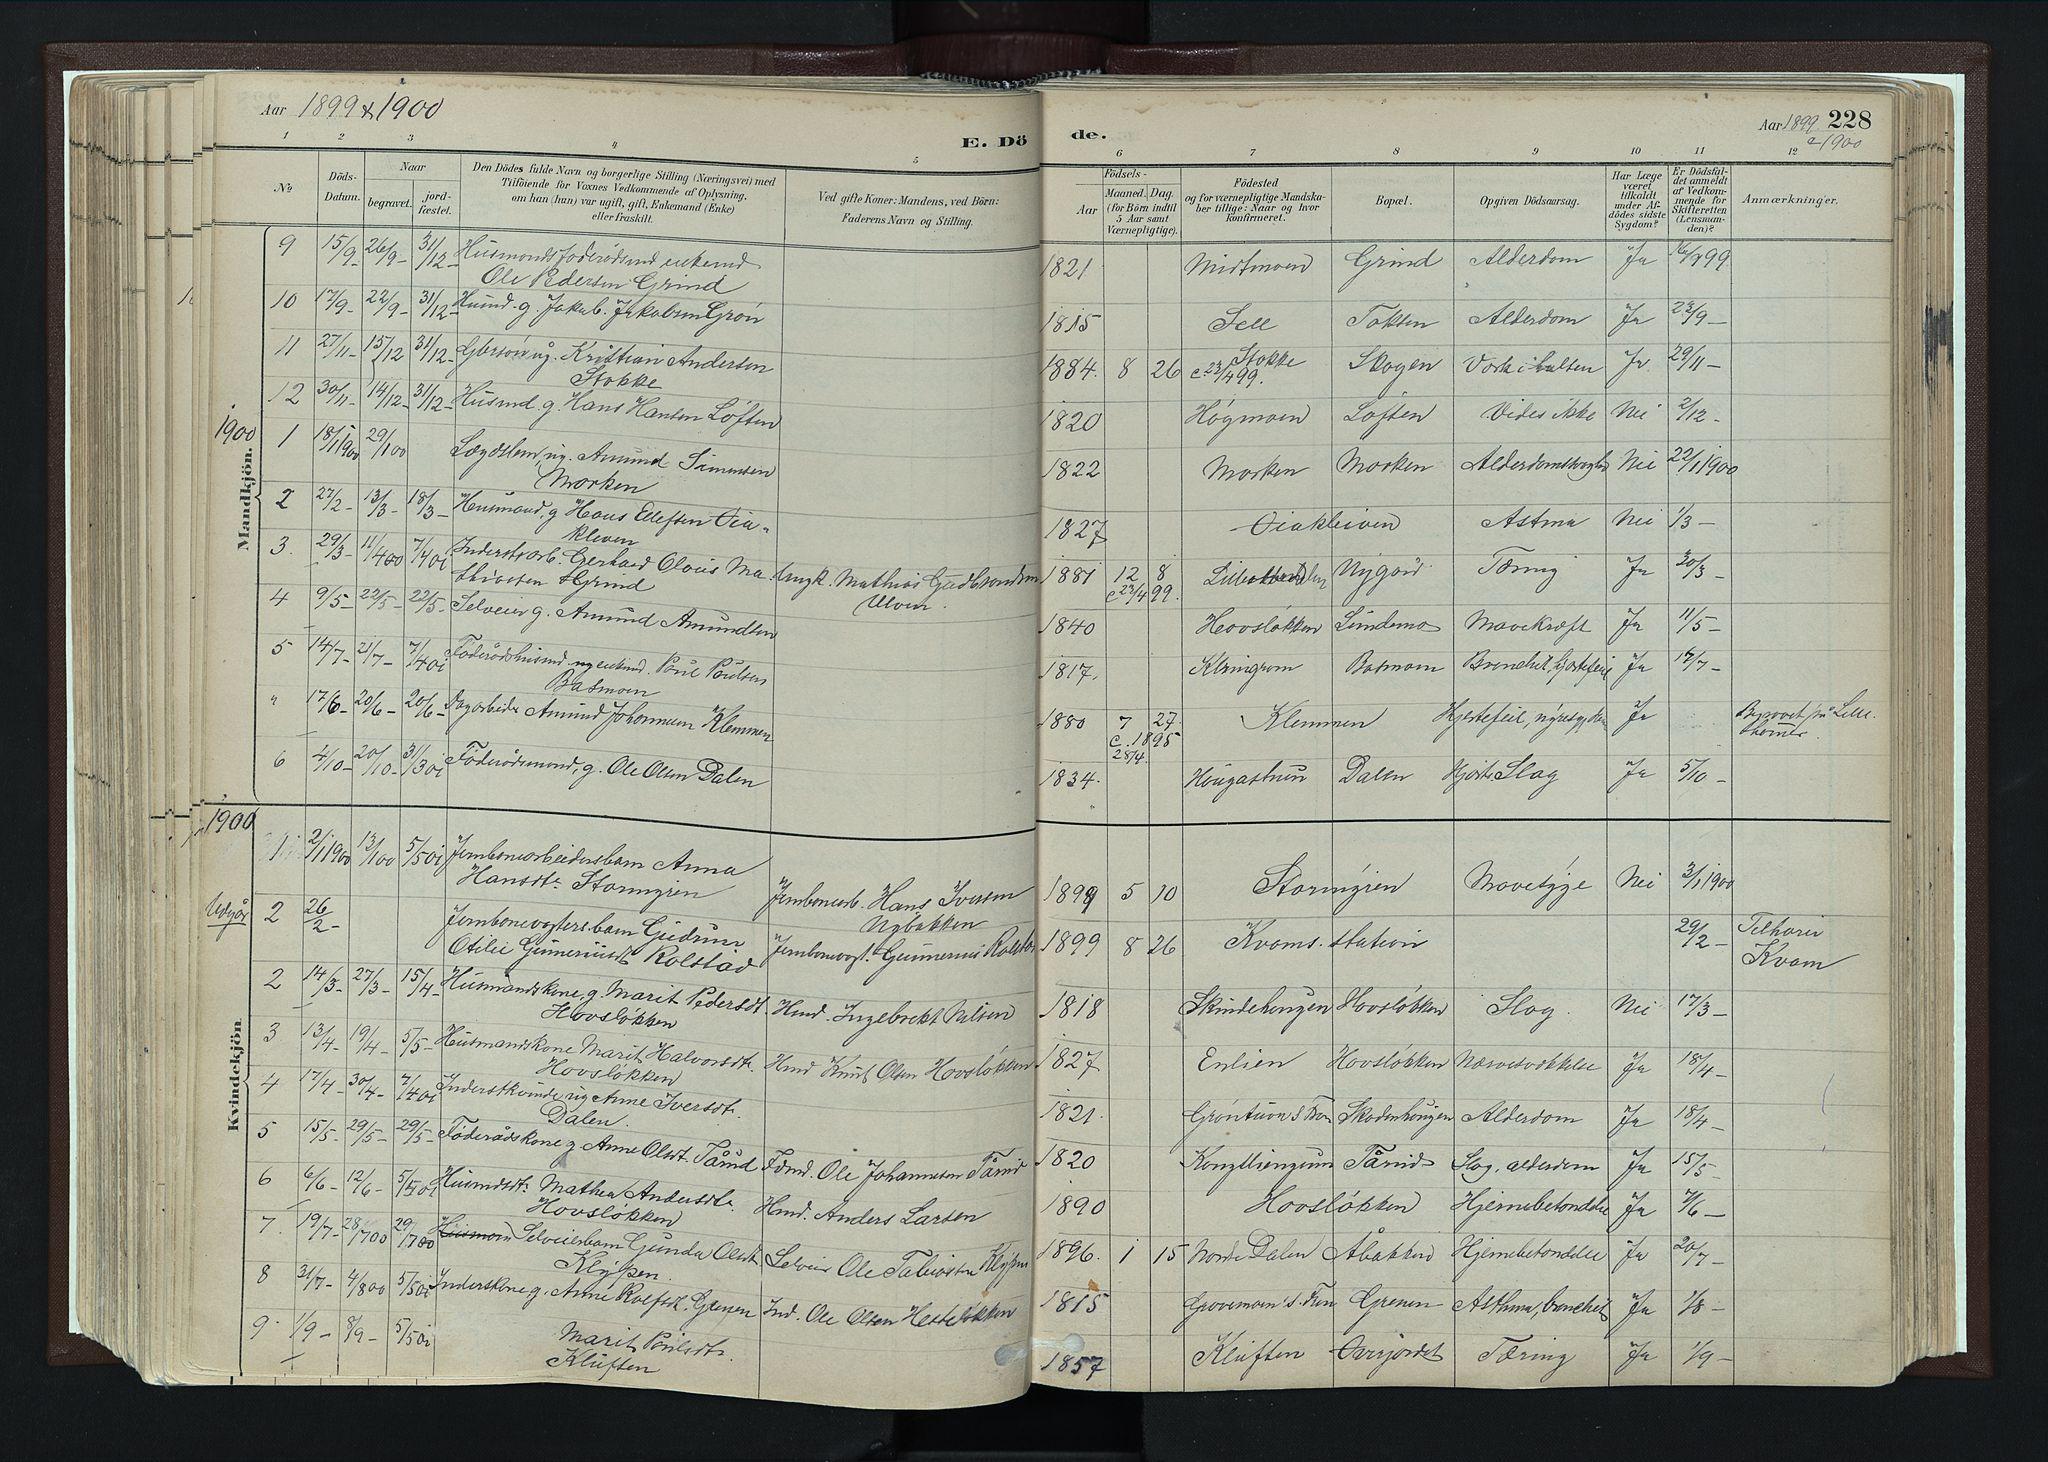 SAH, Nord-Fron prestekontor, Ministerialbok nr. 4, 1884-1914, s. 228